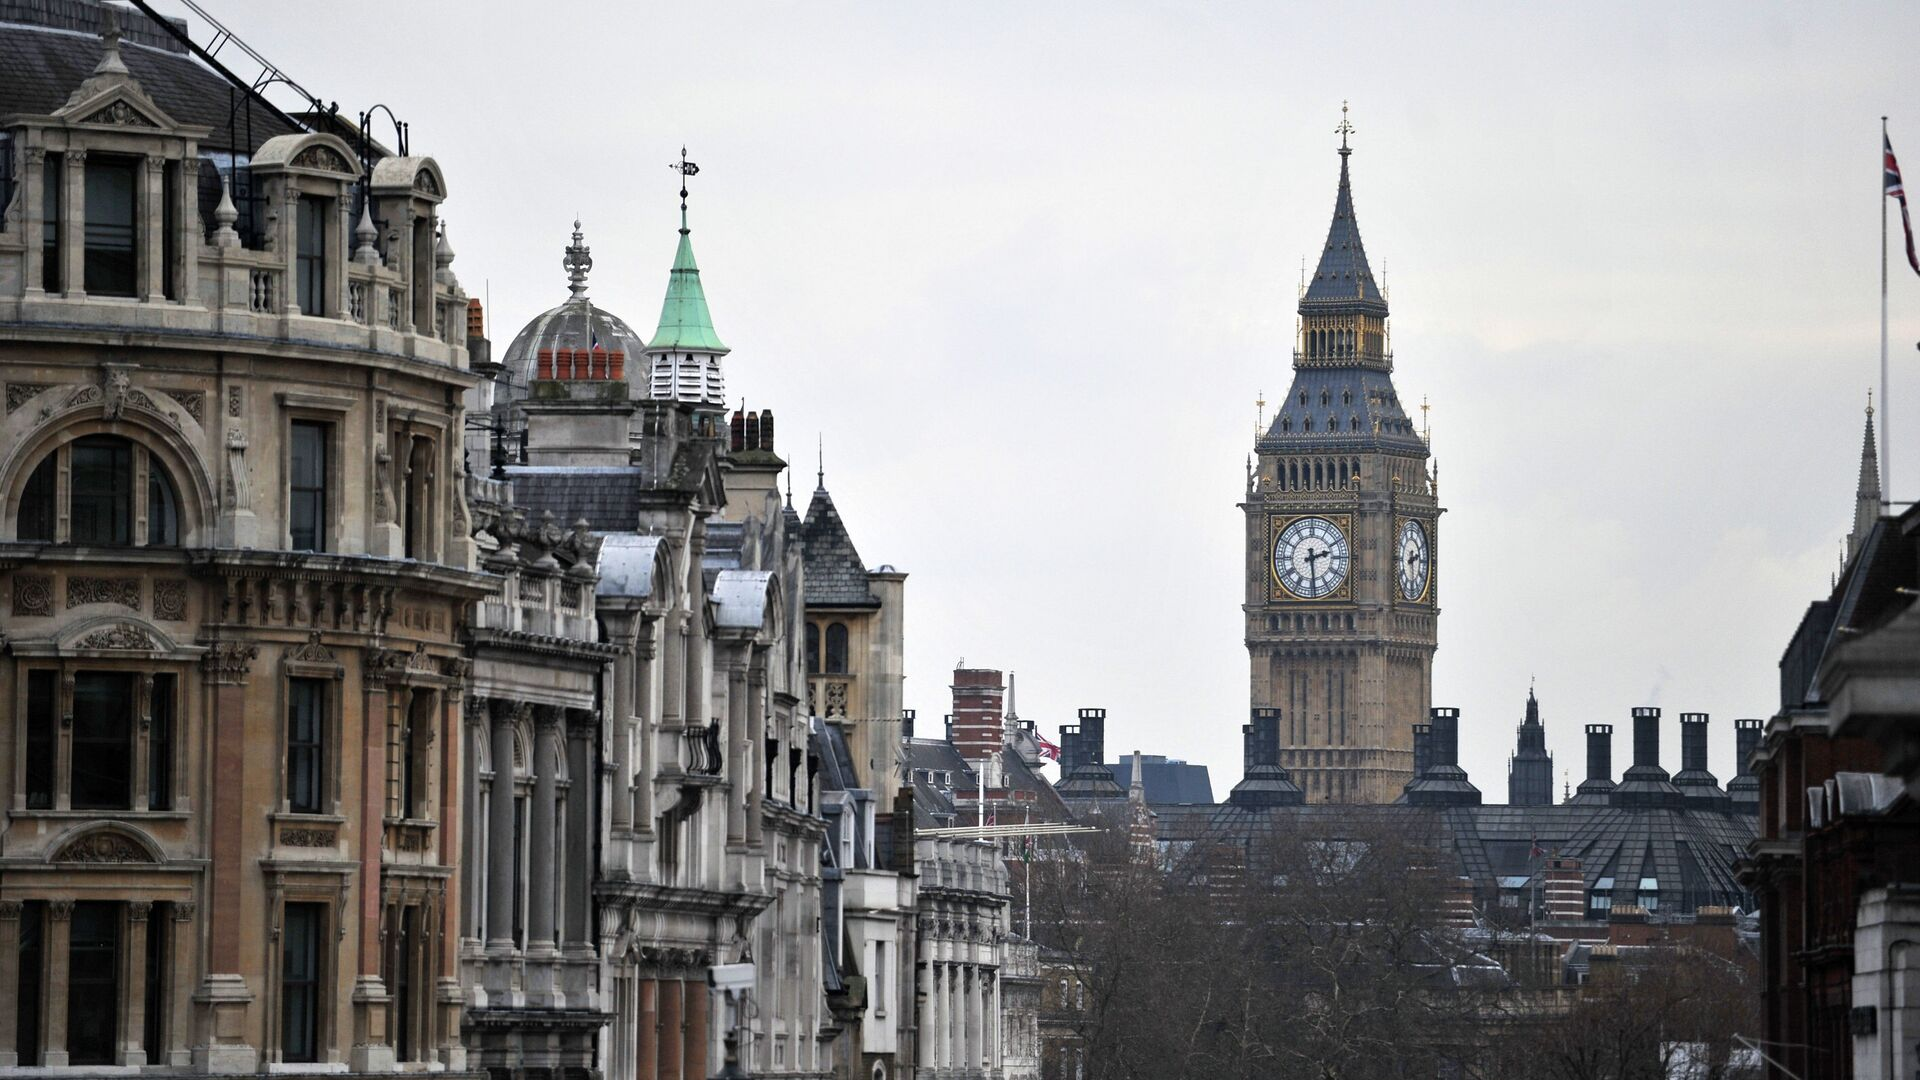 Londres, la capital de Reino Unido - Sputnik Mundo, 1920, 03.05.2021